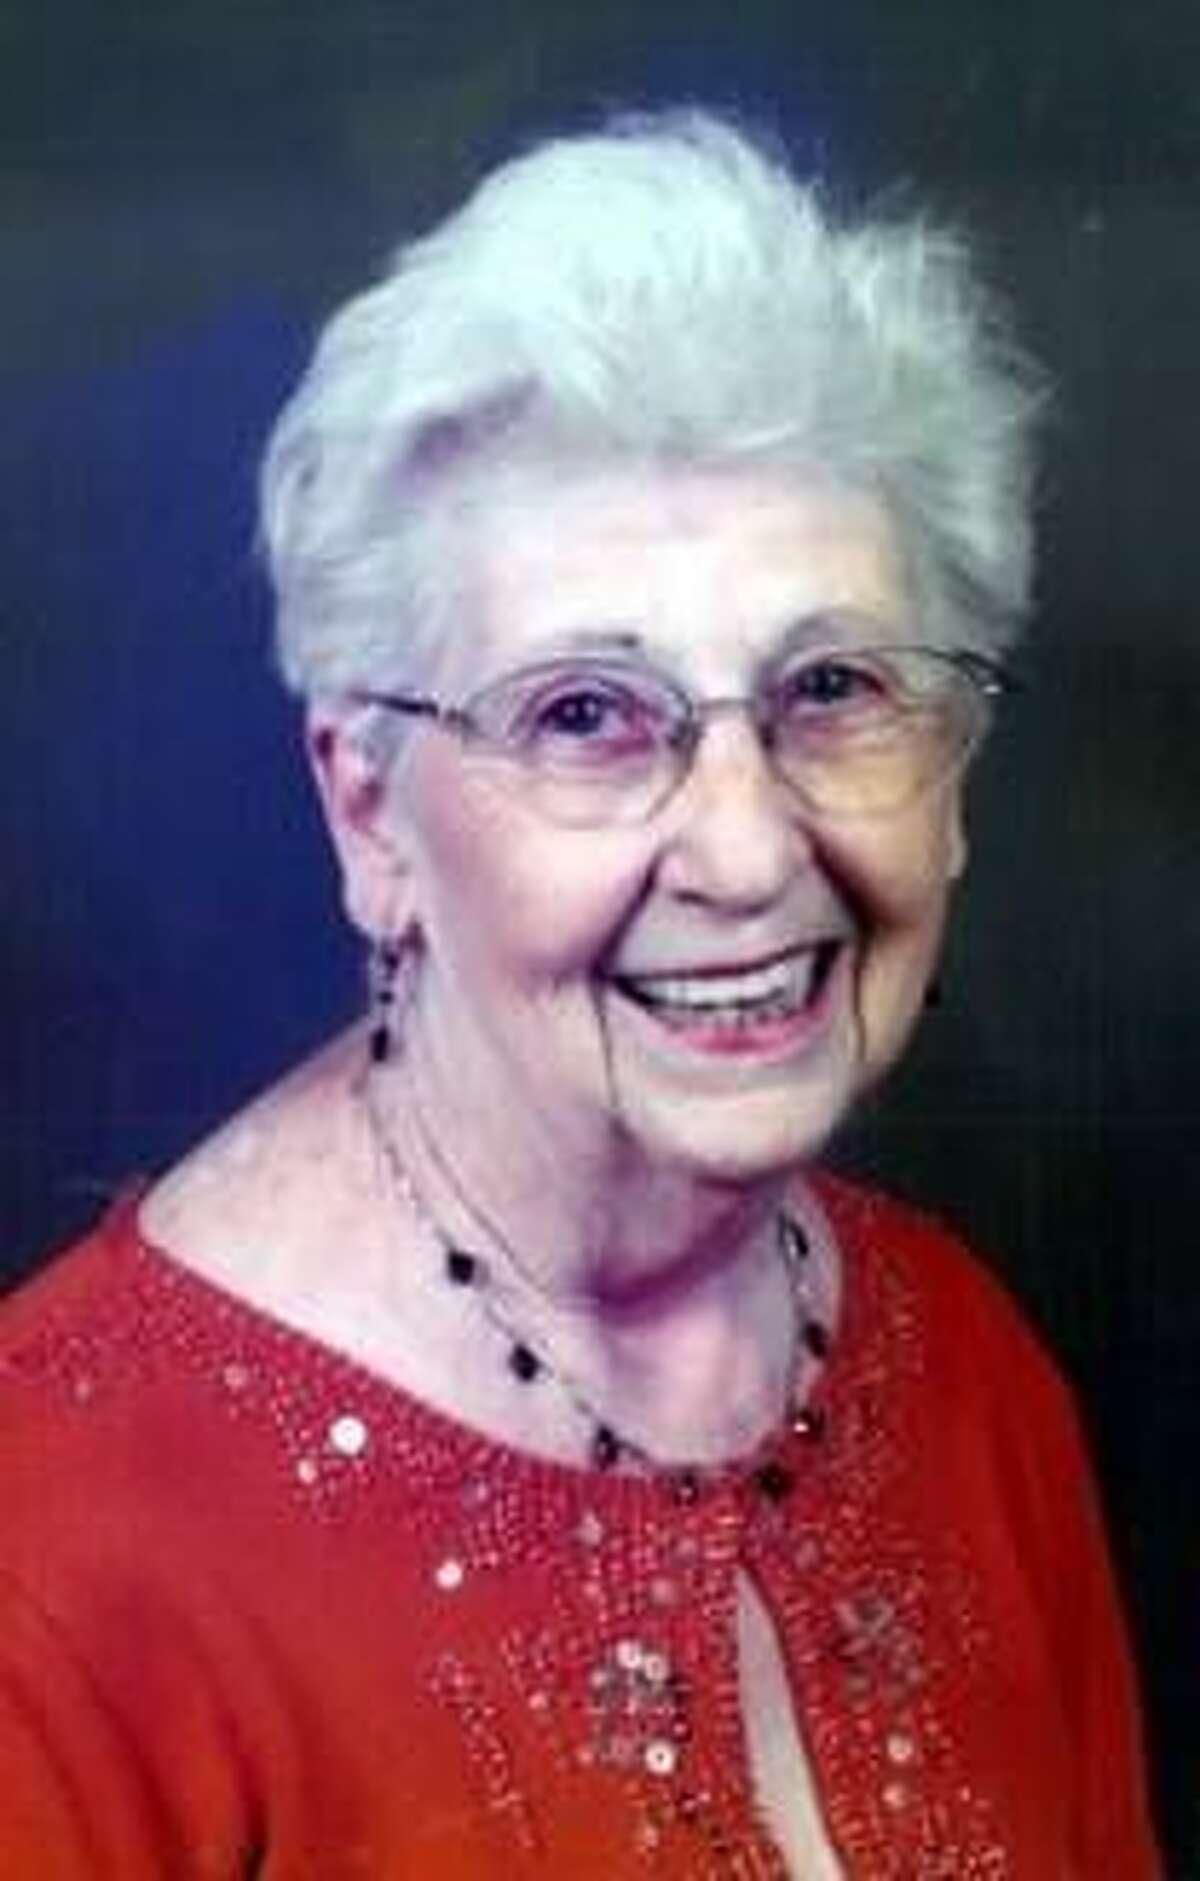 Lorraine Cecilia Seng Clark was known as Scrivener's